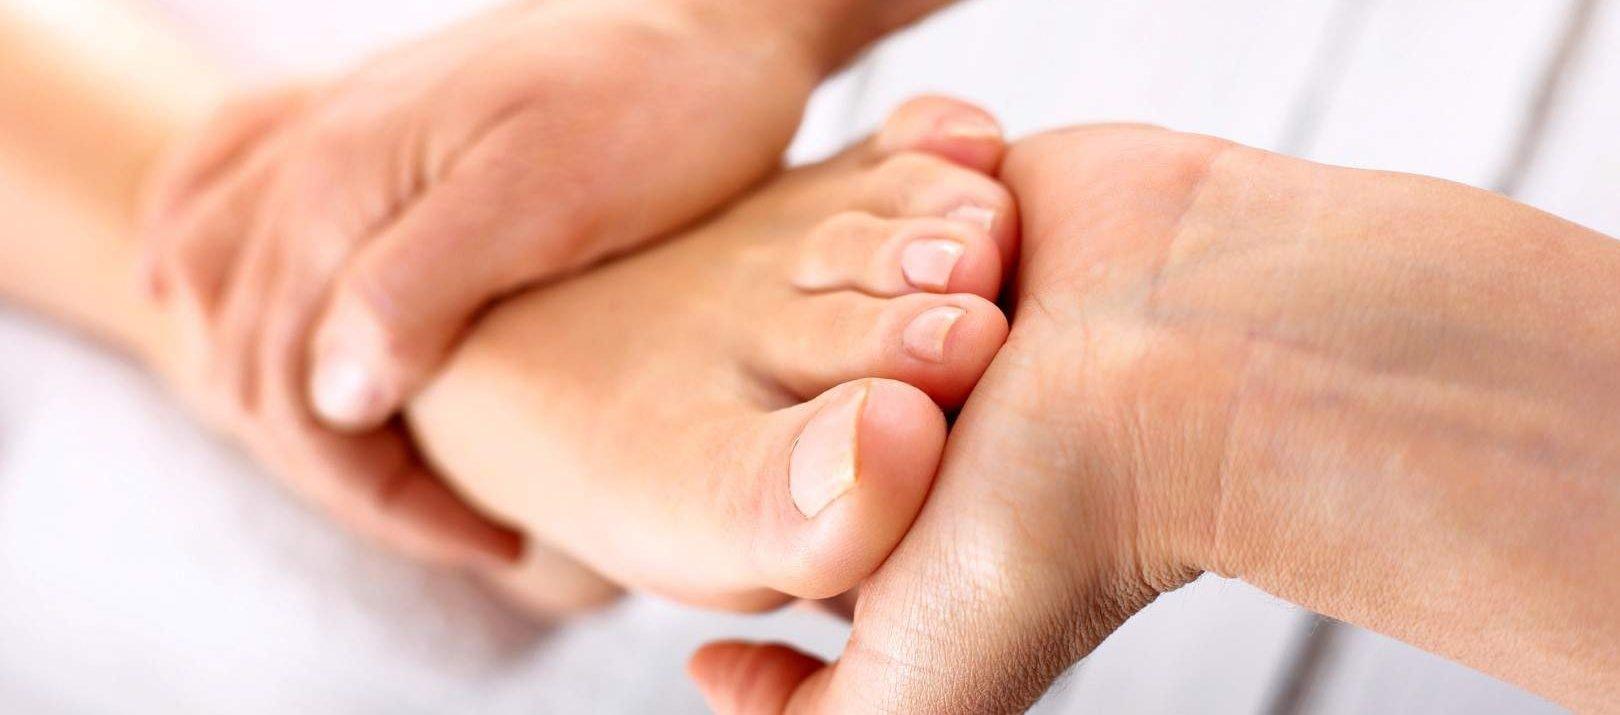 Arthritis In The Feet